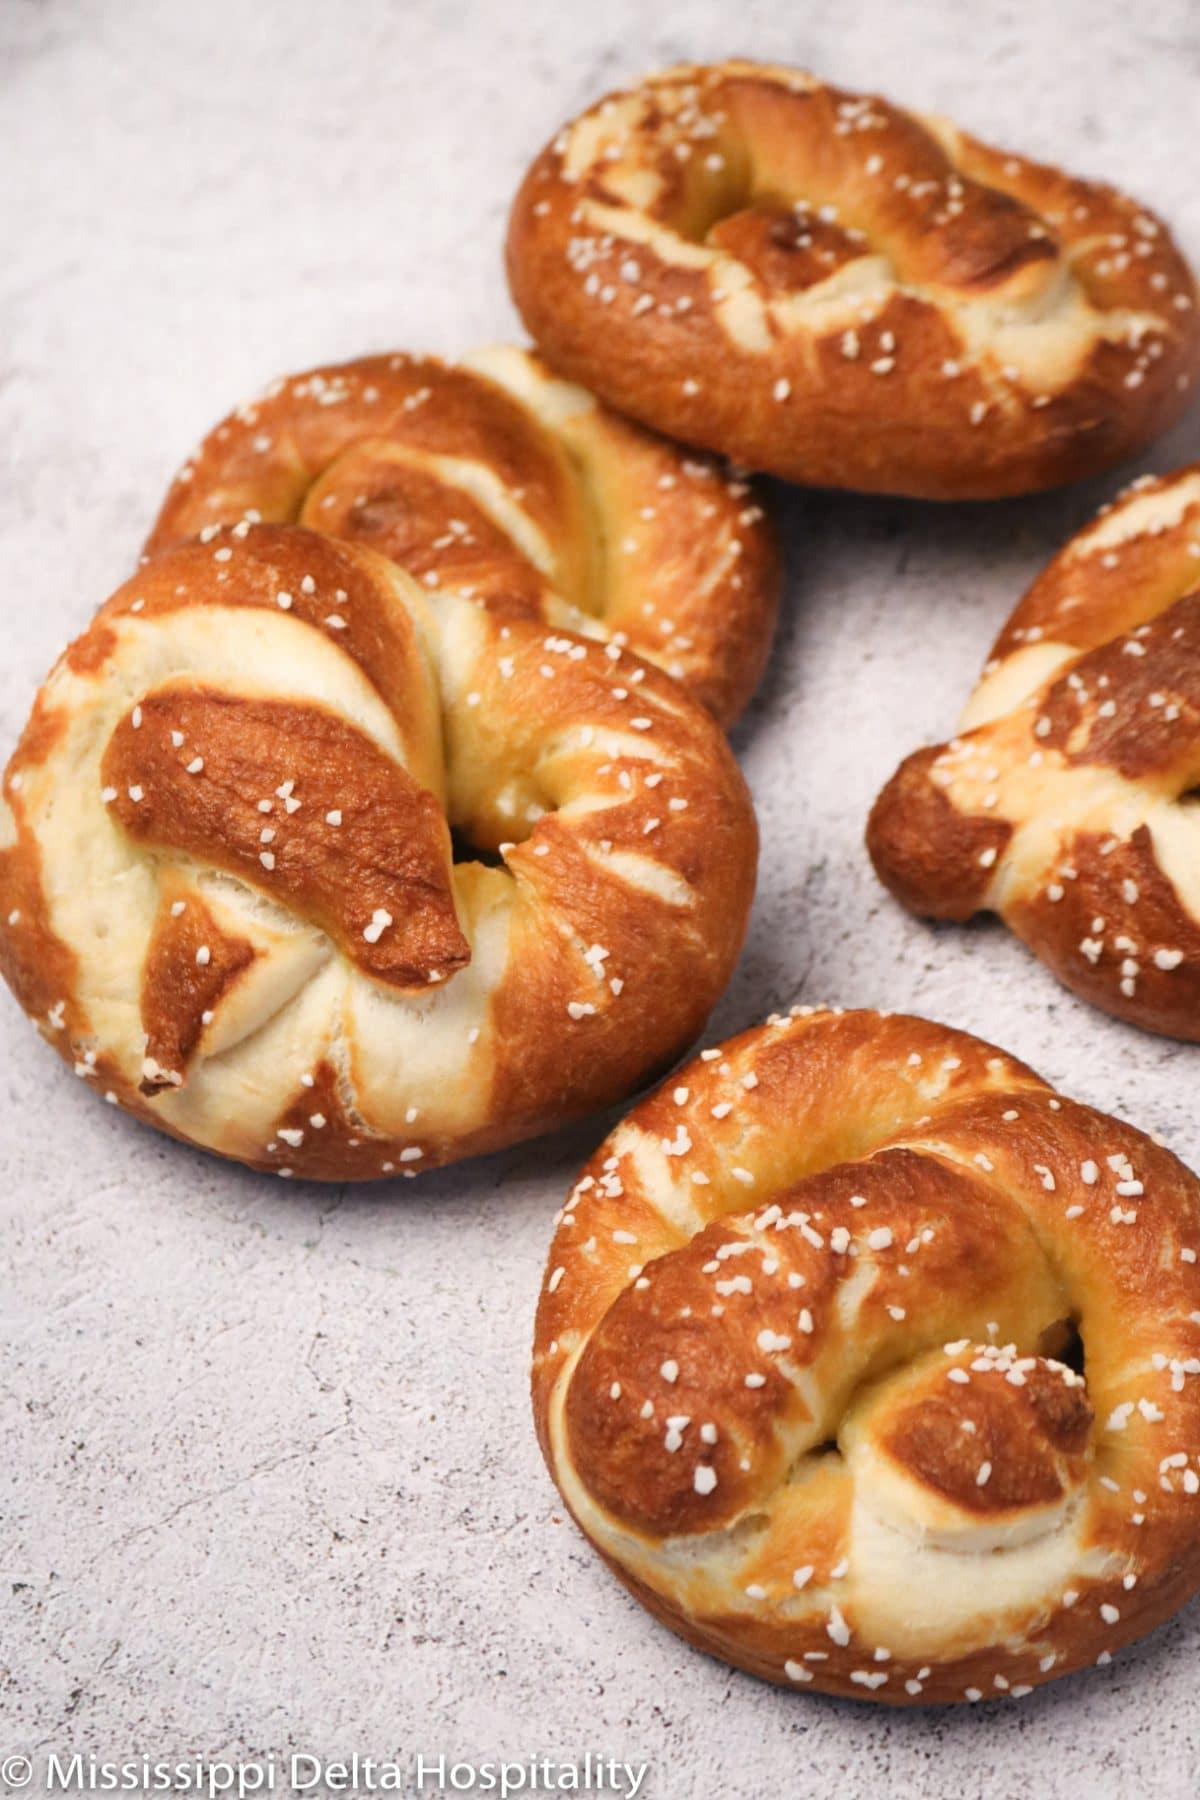 five pretzels laying on a concrete board.